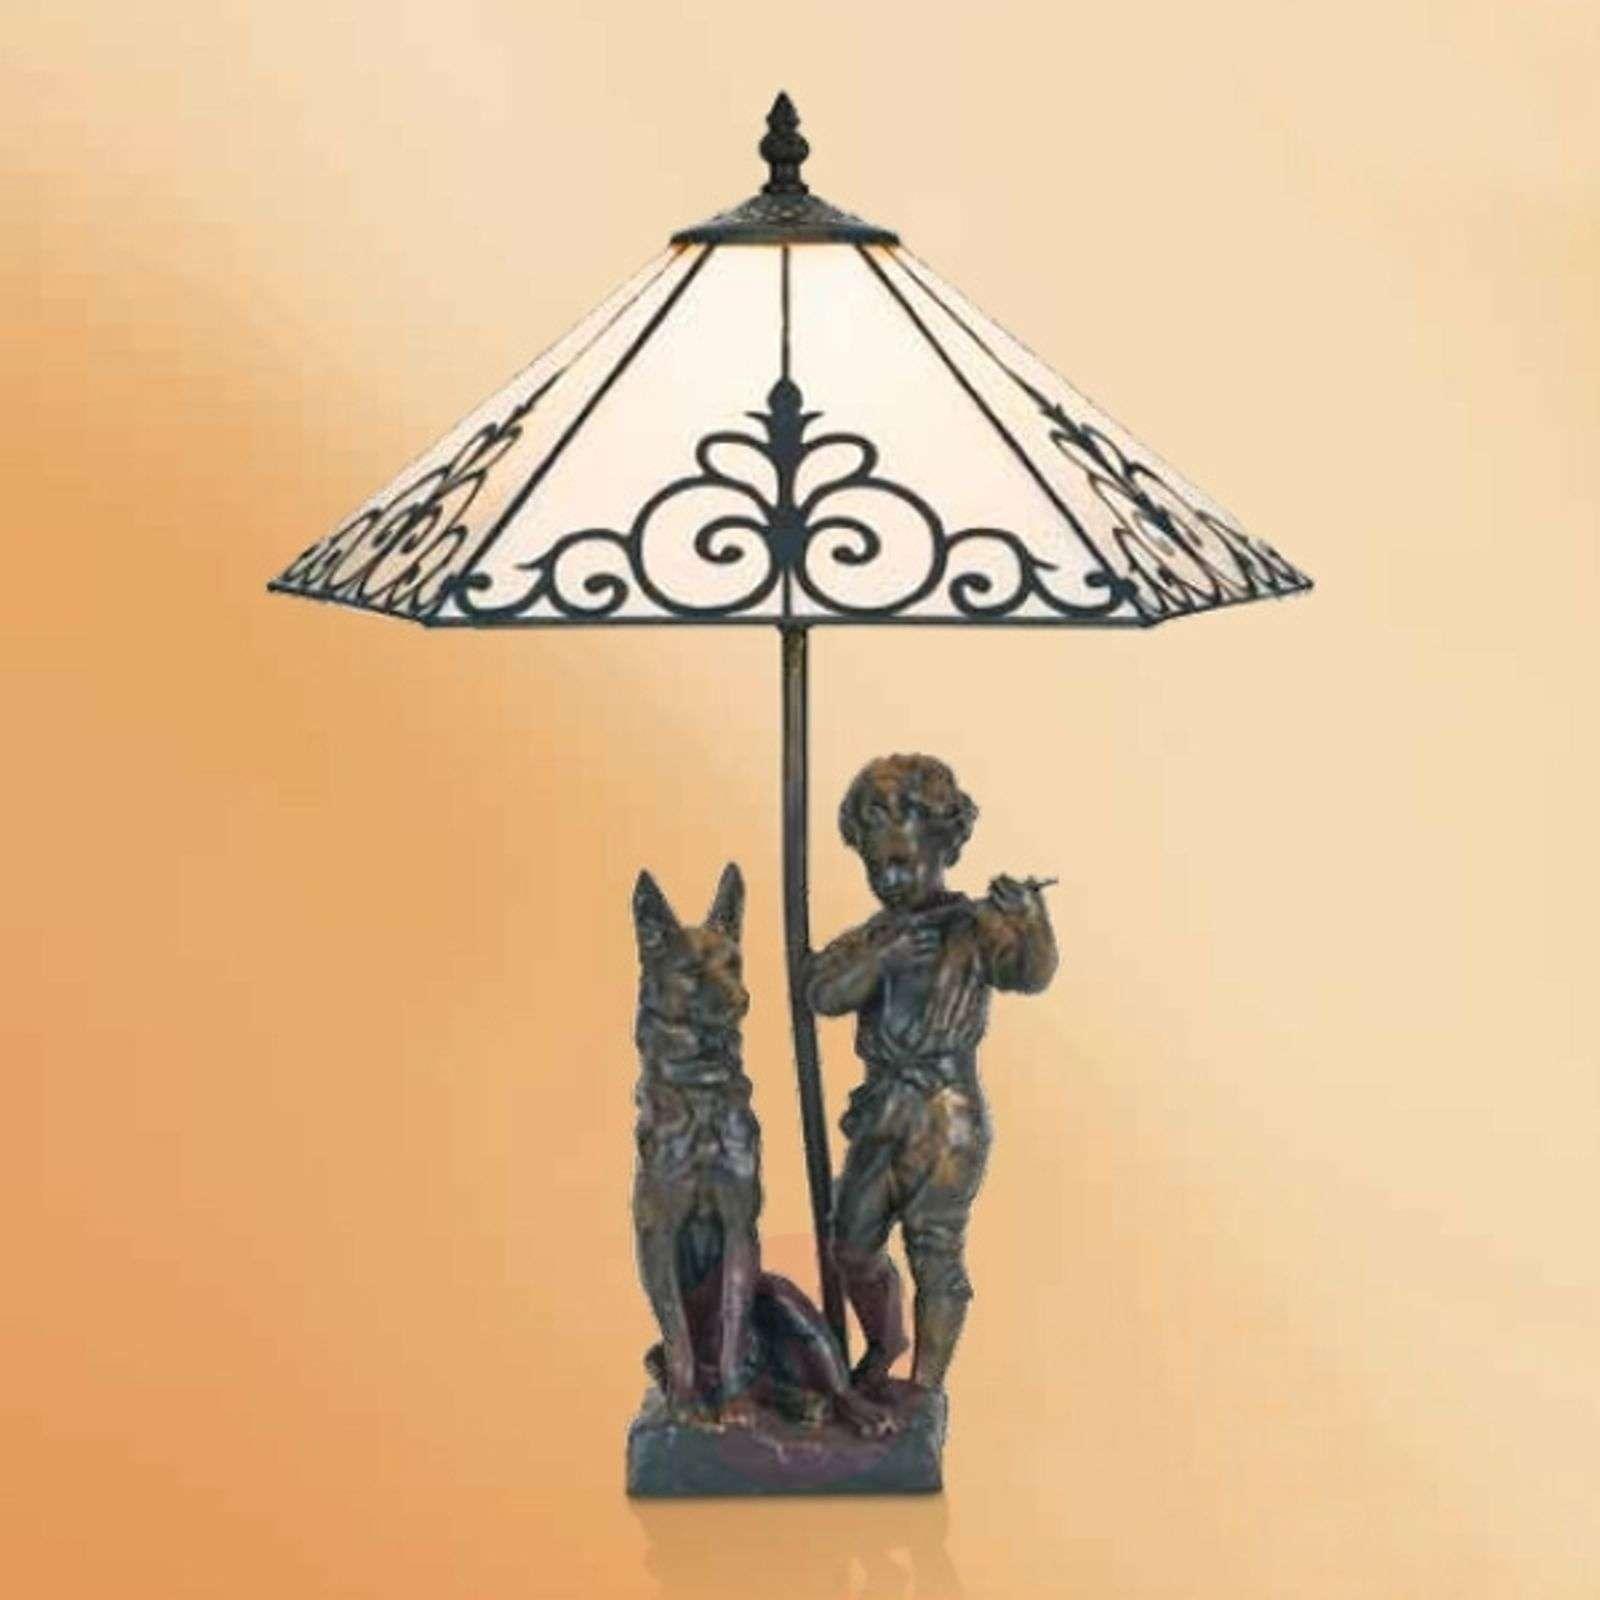 Exclusive table lamp Janett, 46 cm-1032303-01